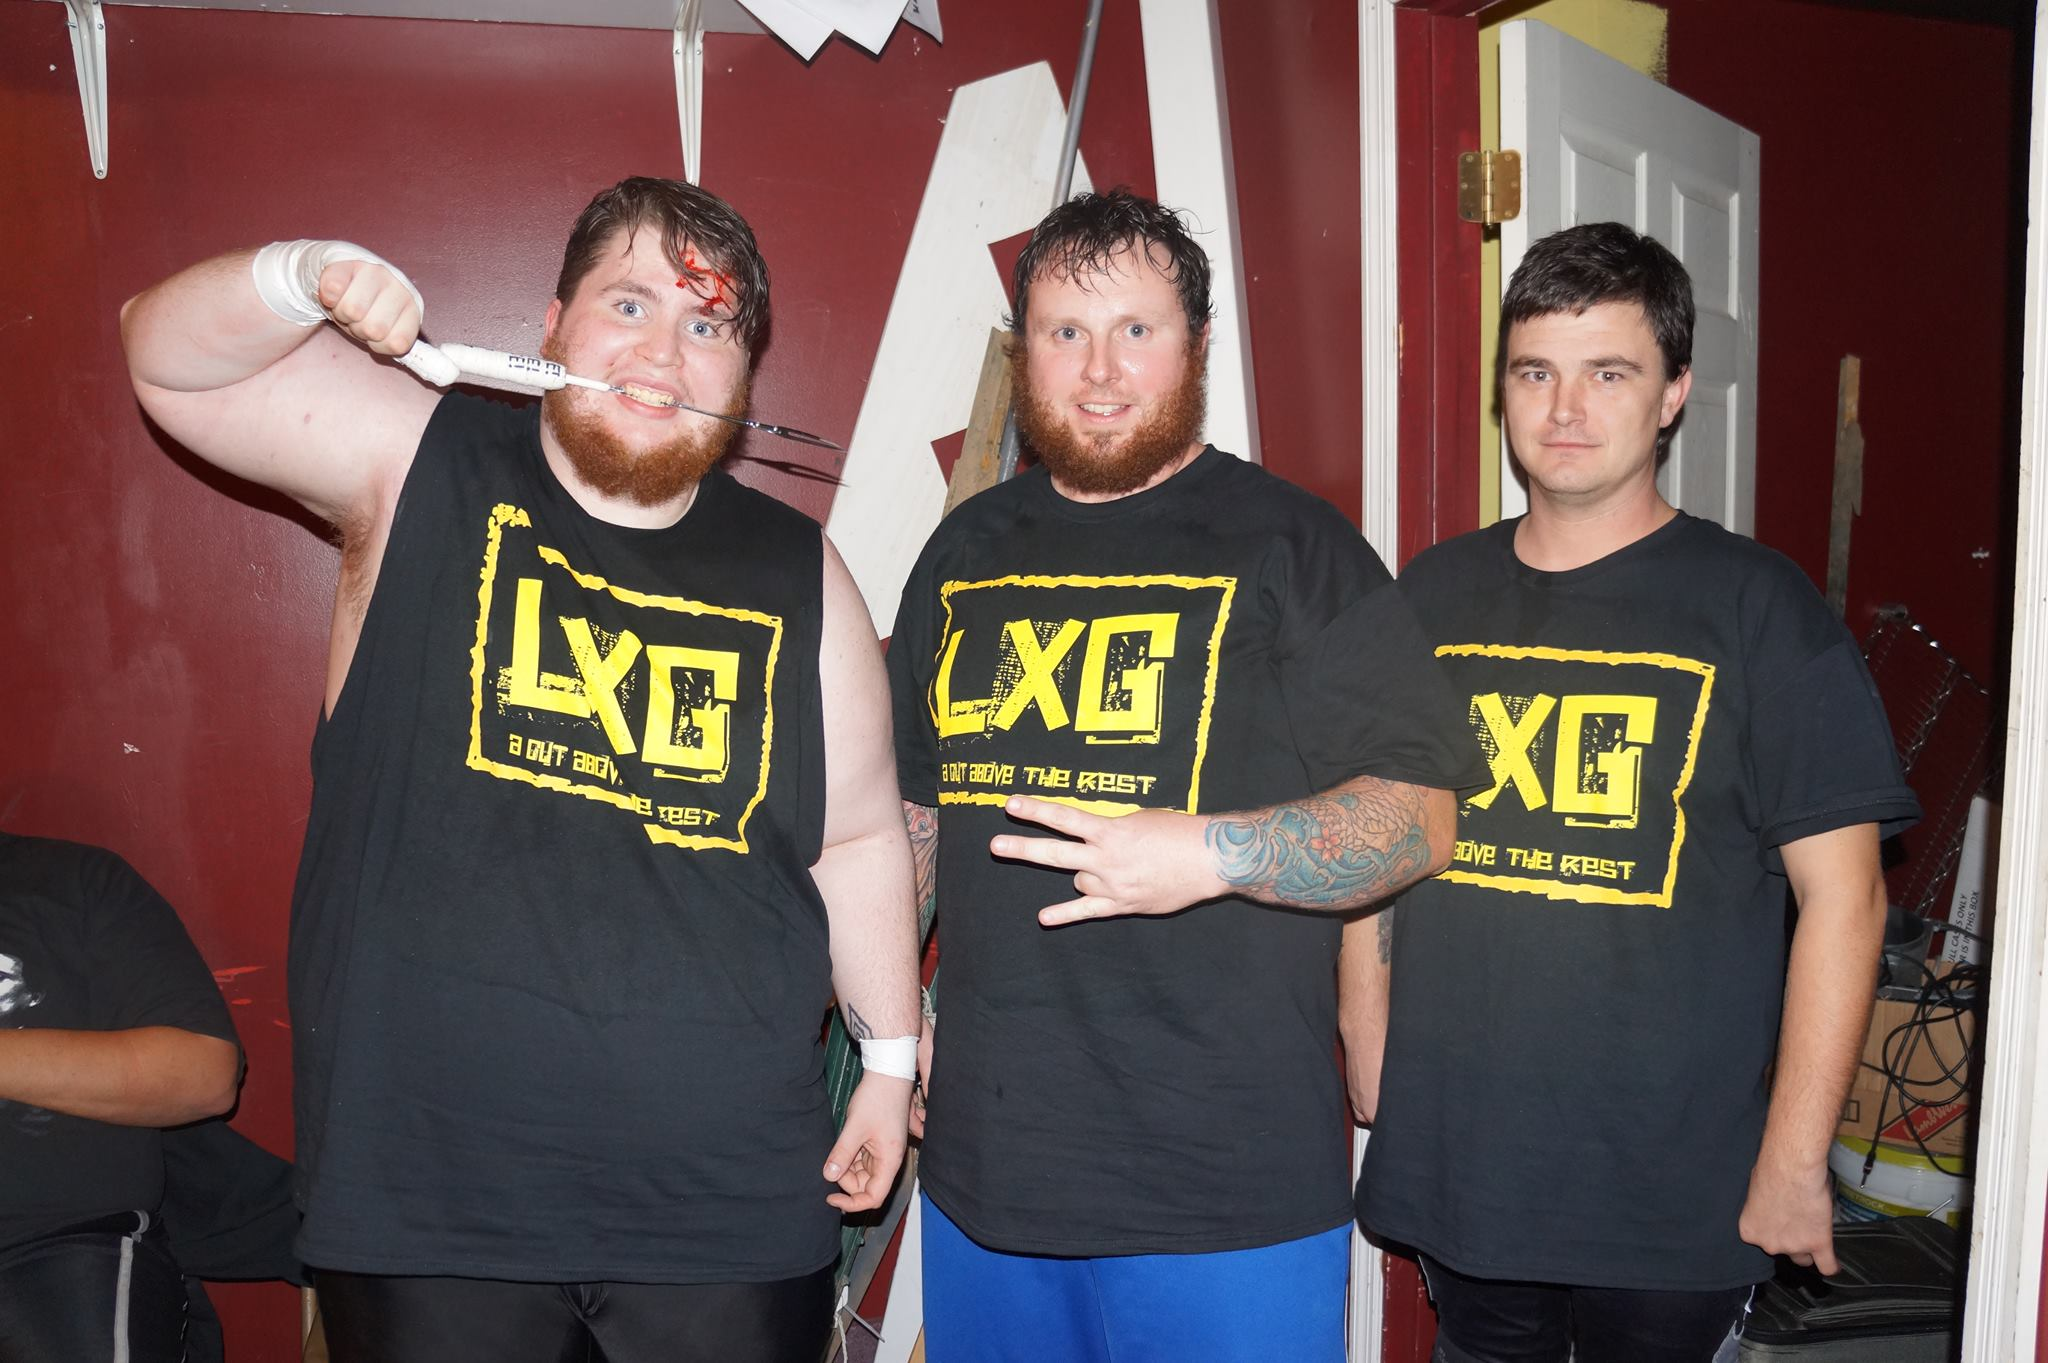 Custom T Shirts For Pro Wrestling With Custom Ink Shirt Design Ideas